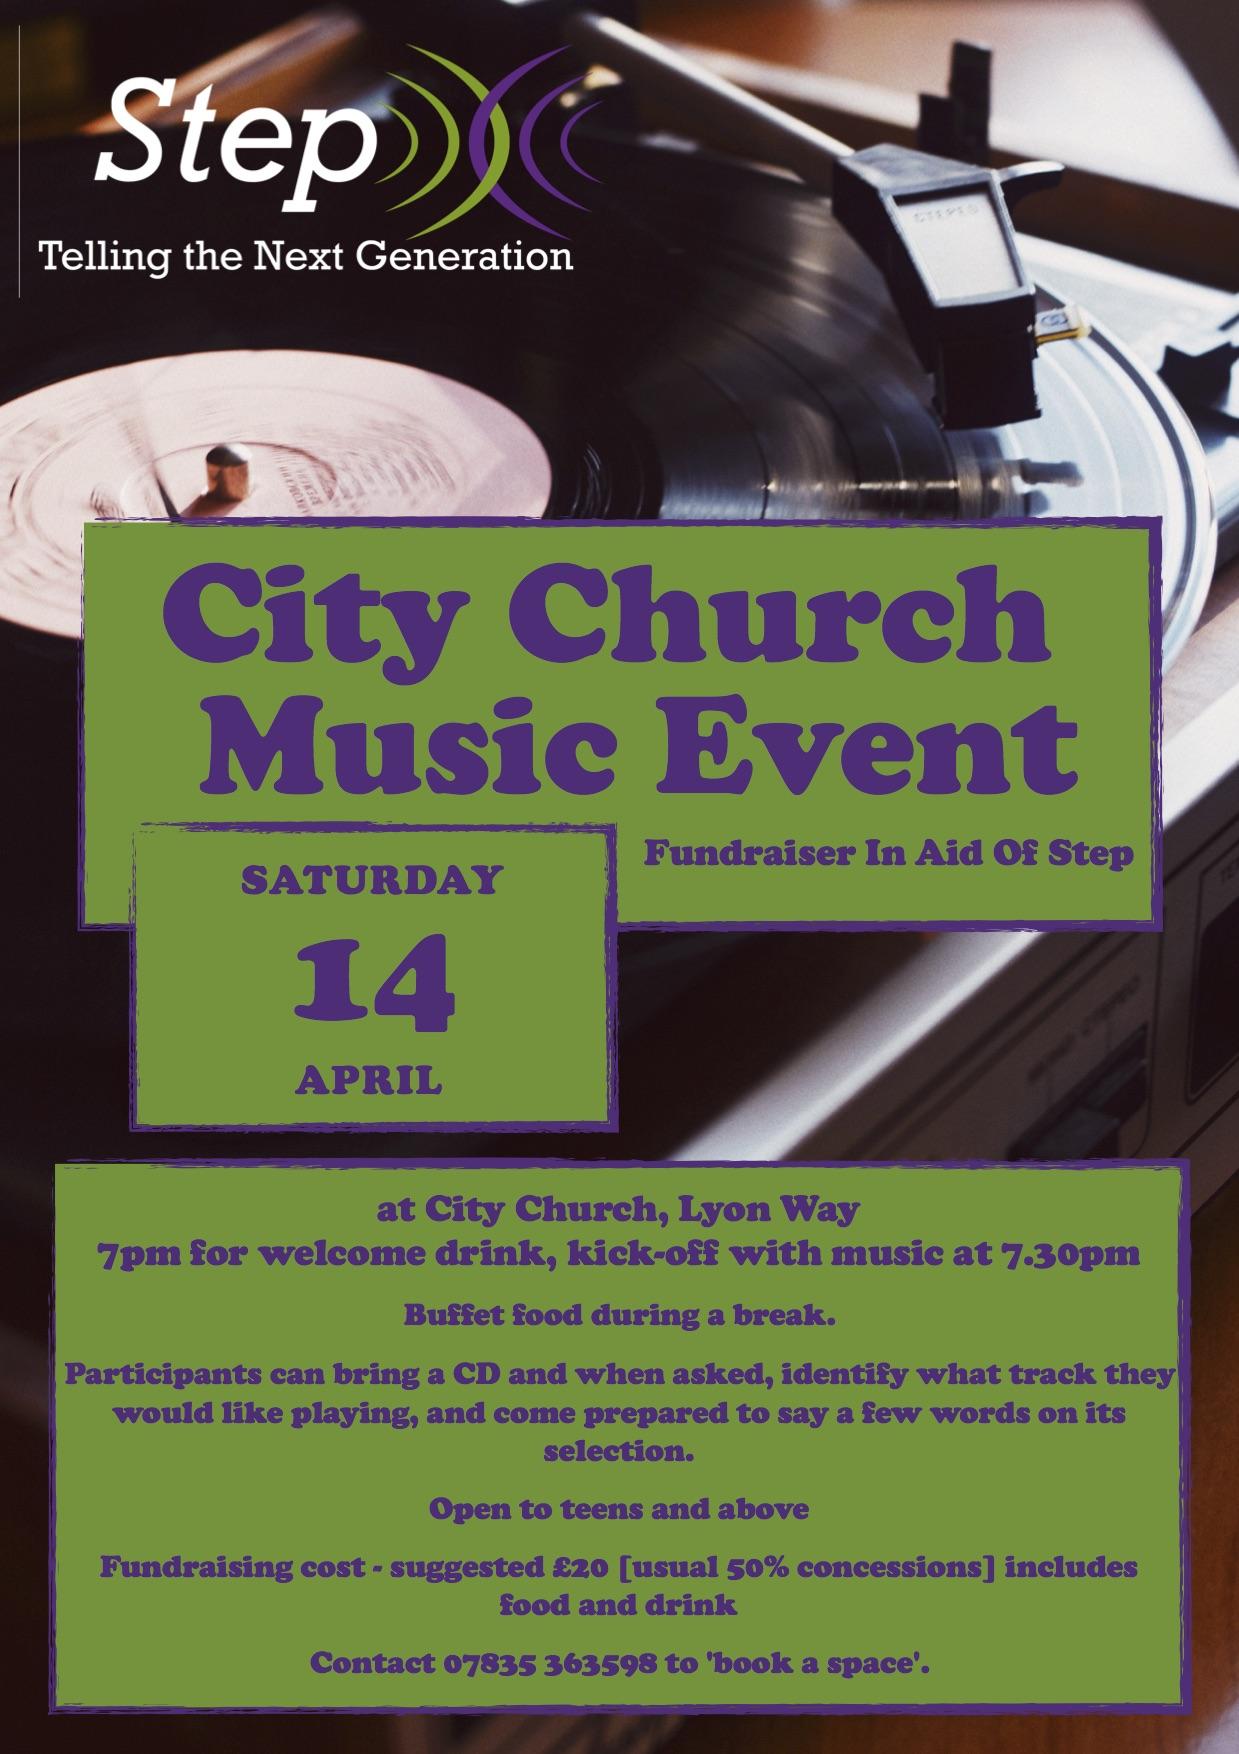 City Church Music Event 2018.jpg